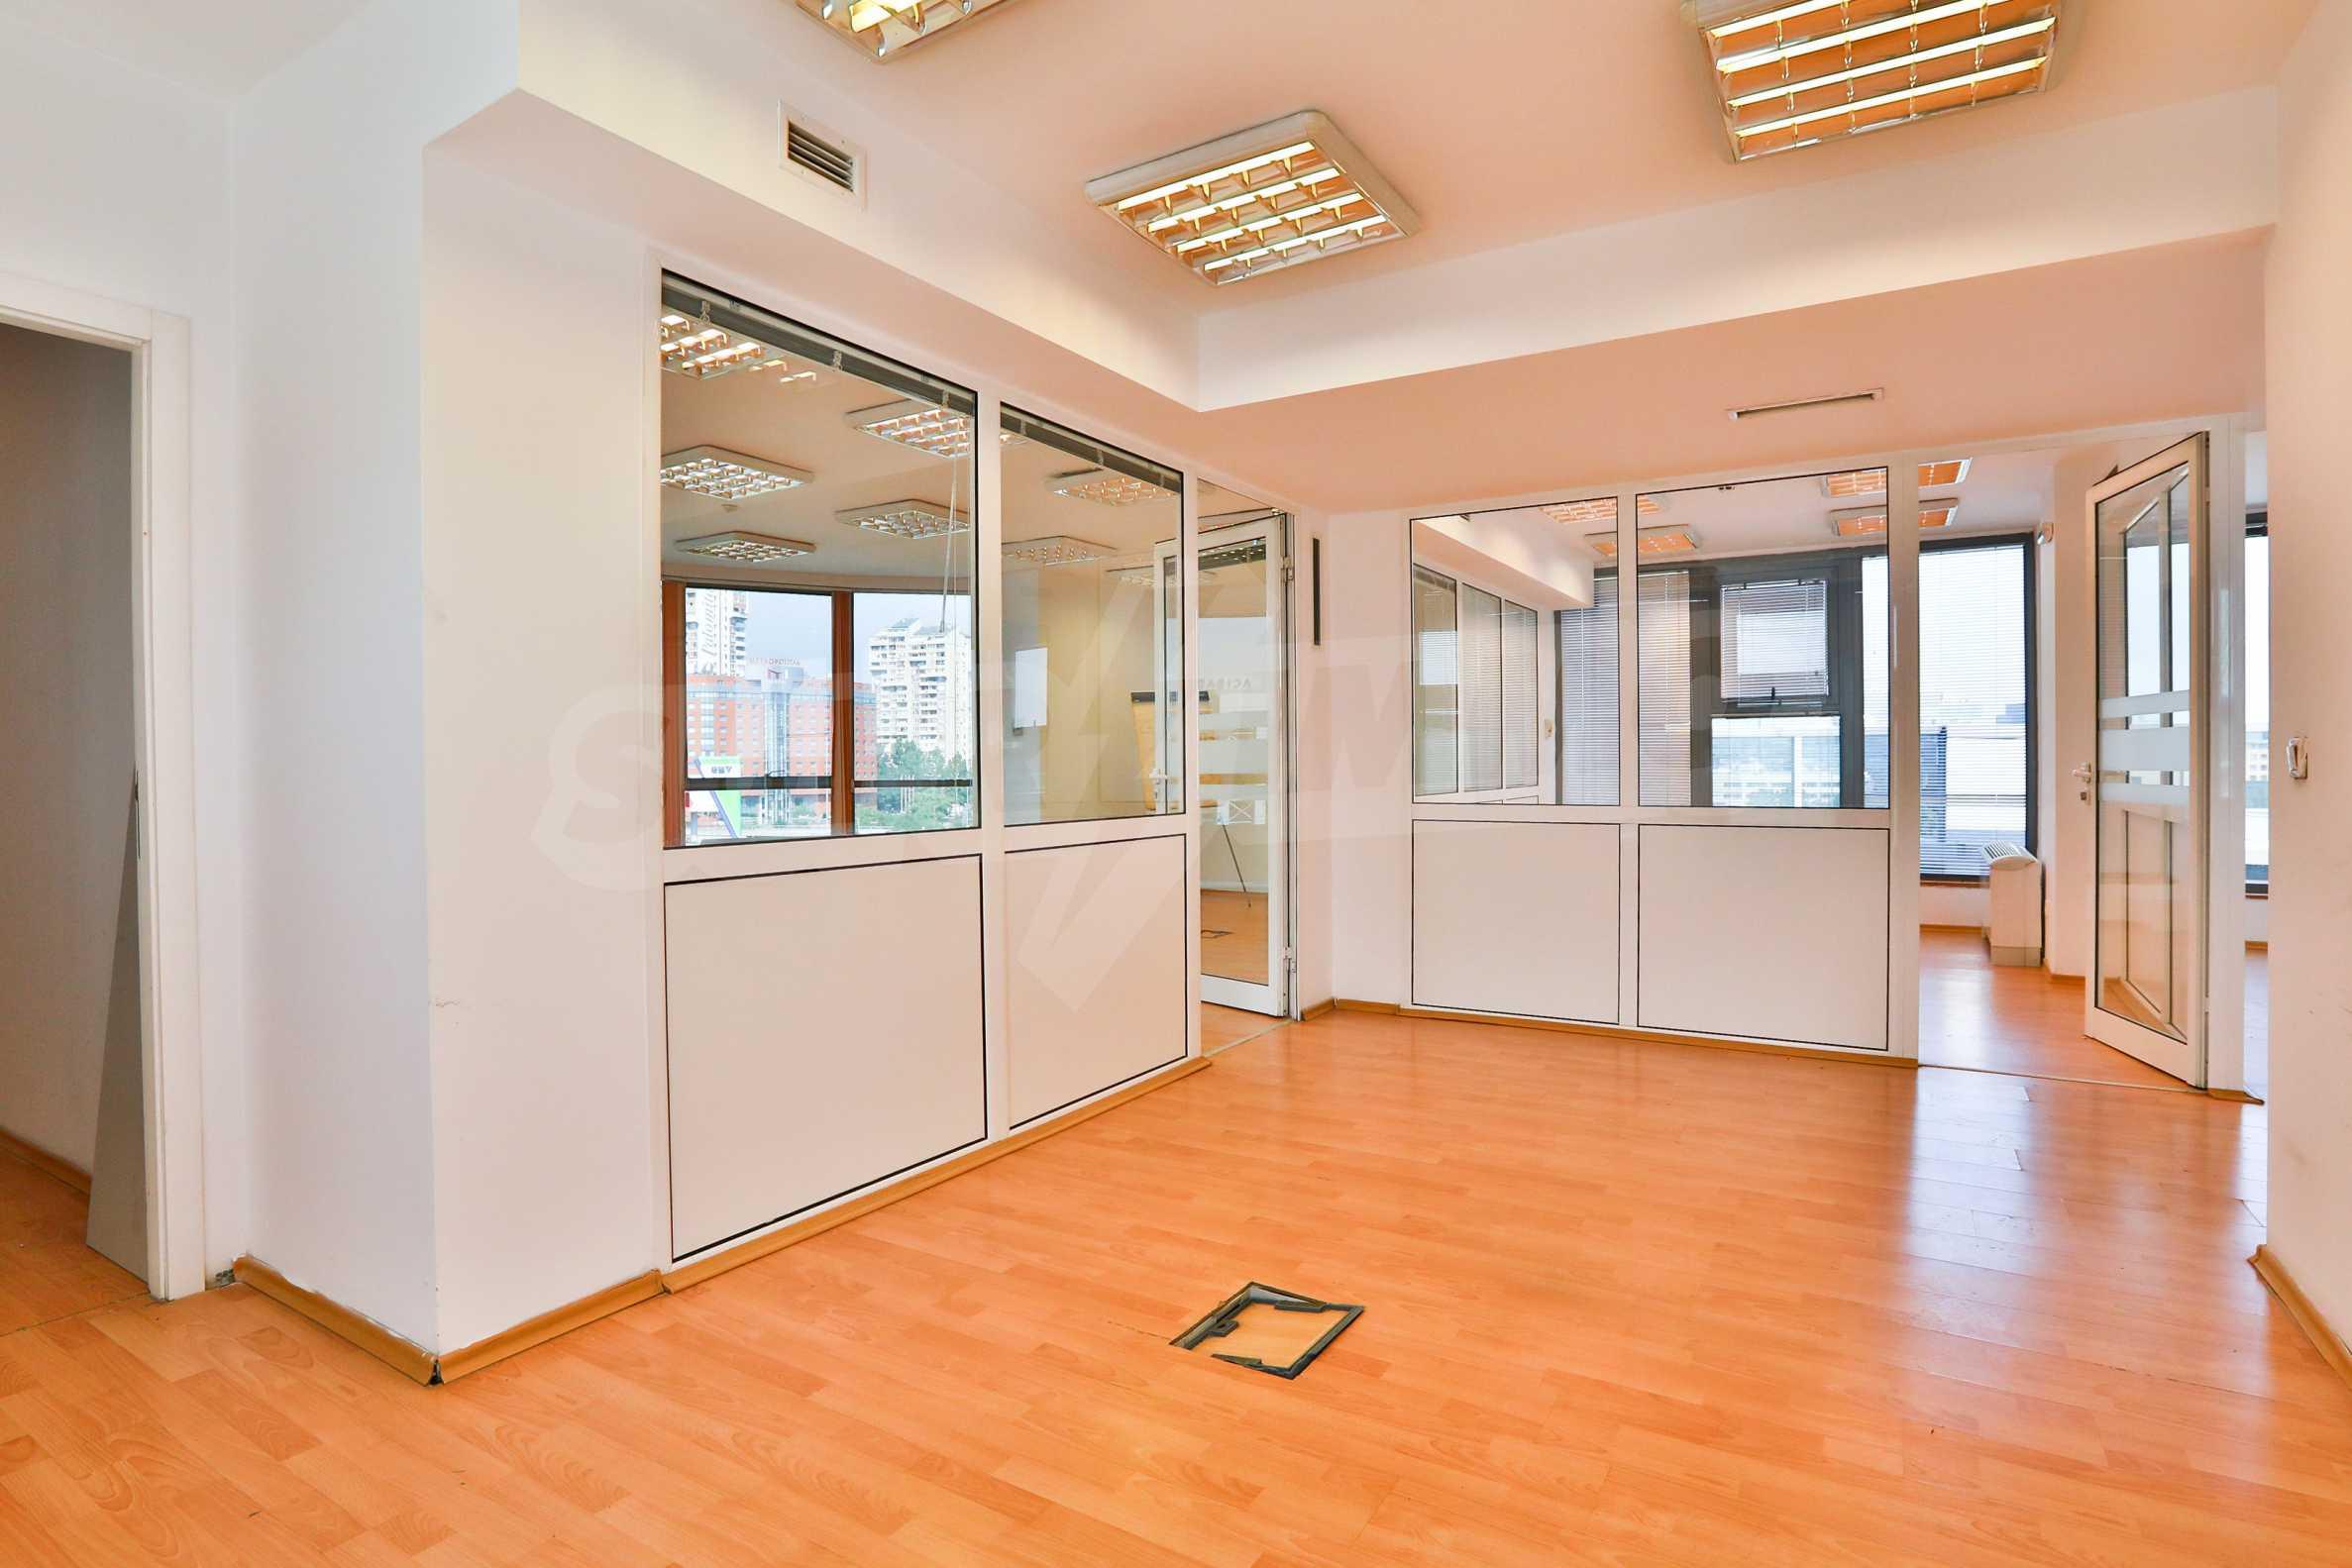 Офис в бизнес сграда висок клас на бул. Цариградско шосе 12